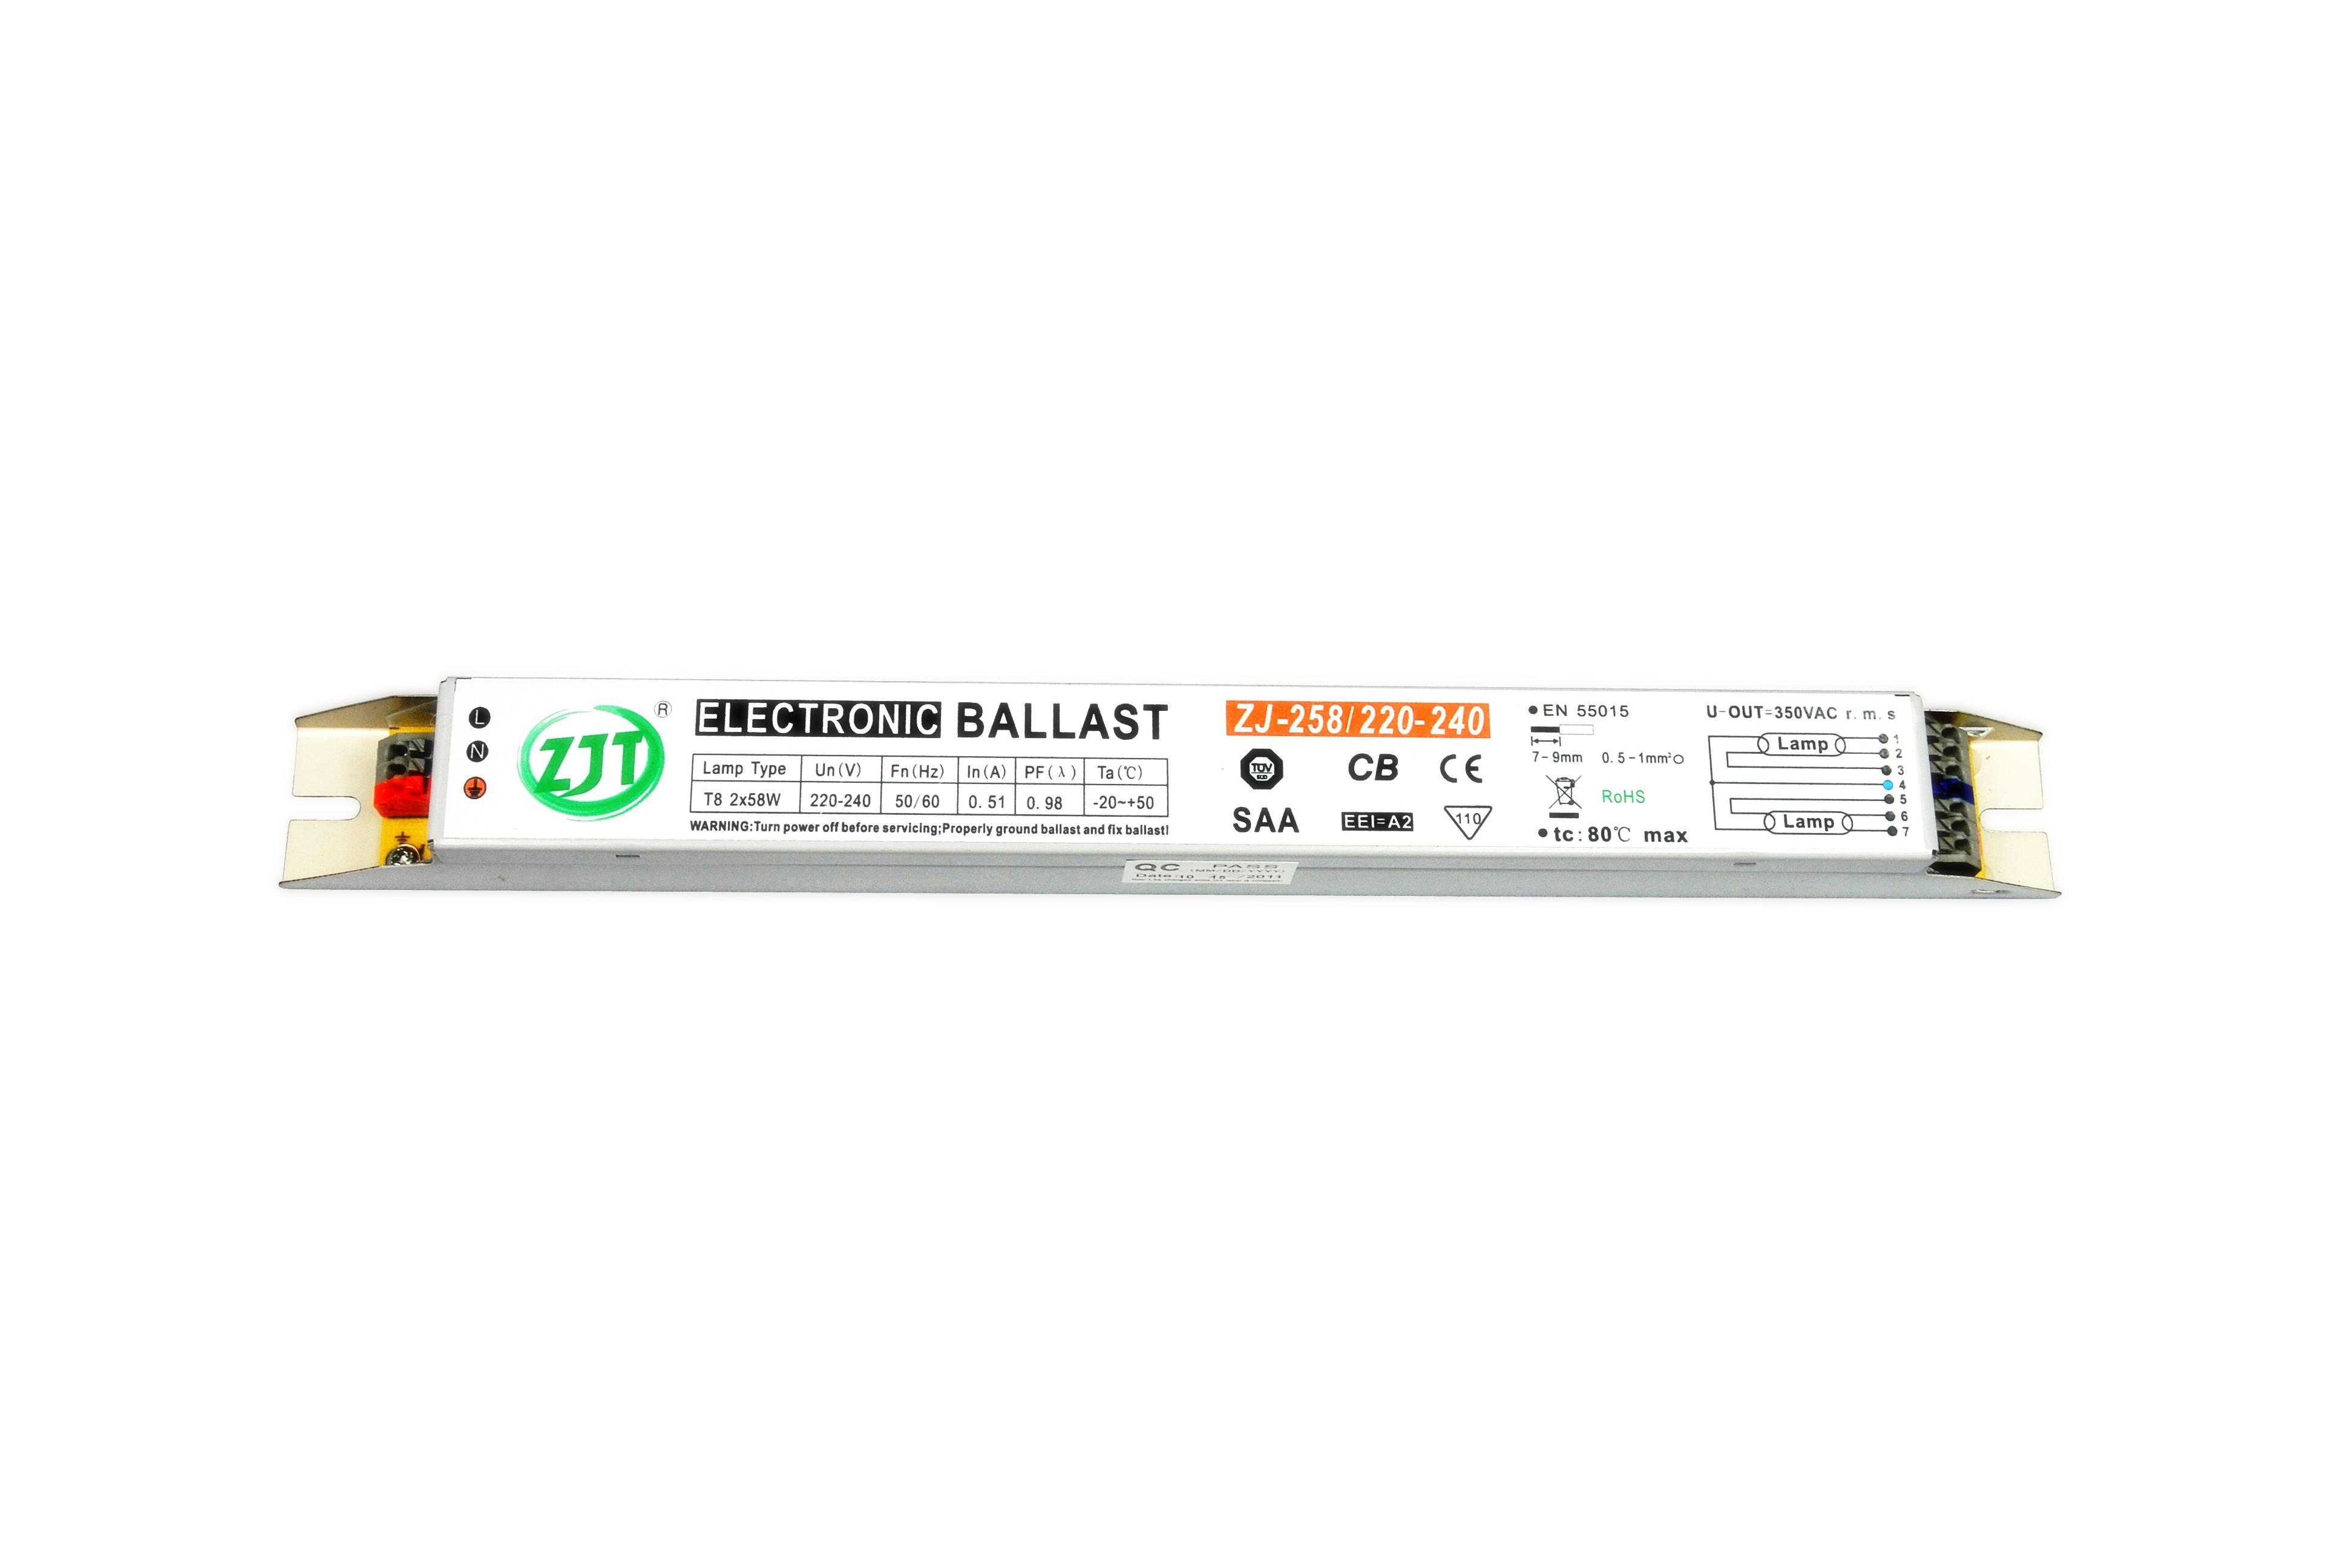 T8 2x58w Electronic Ballast With Tuv Ce Cb Saa Rohs Emc Certificate